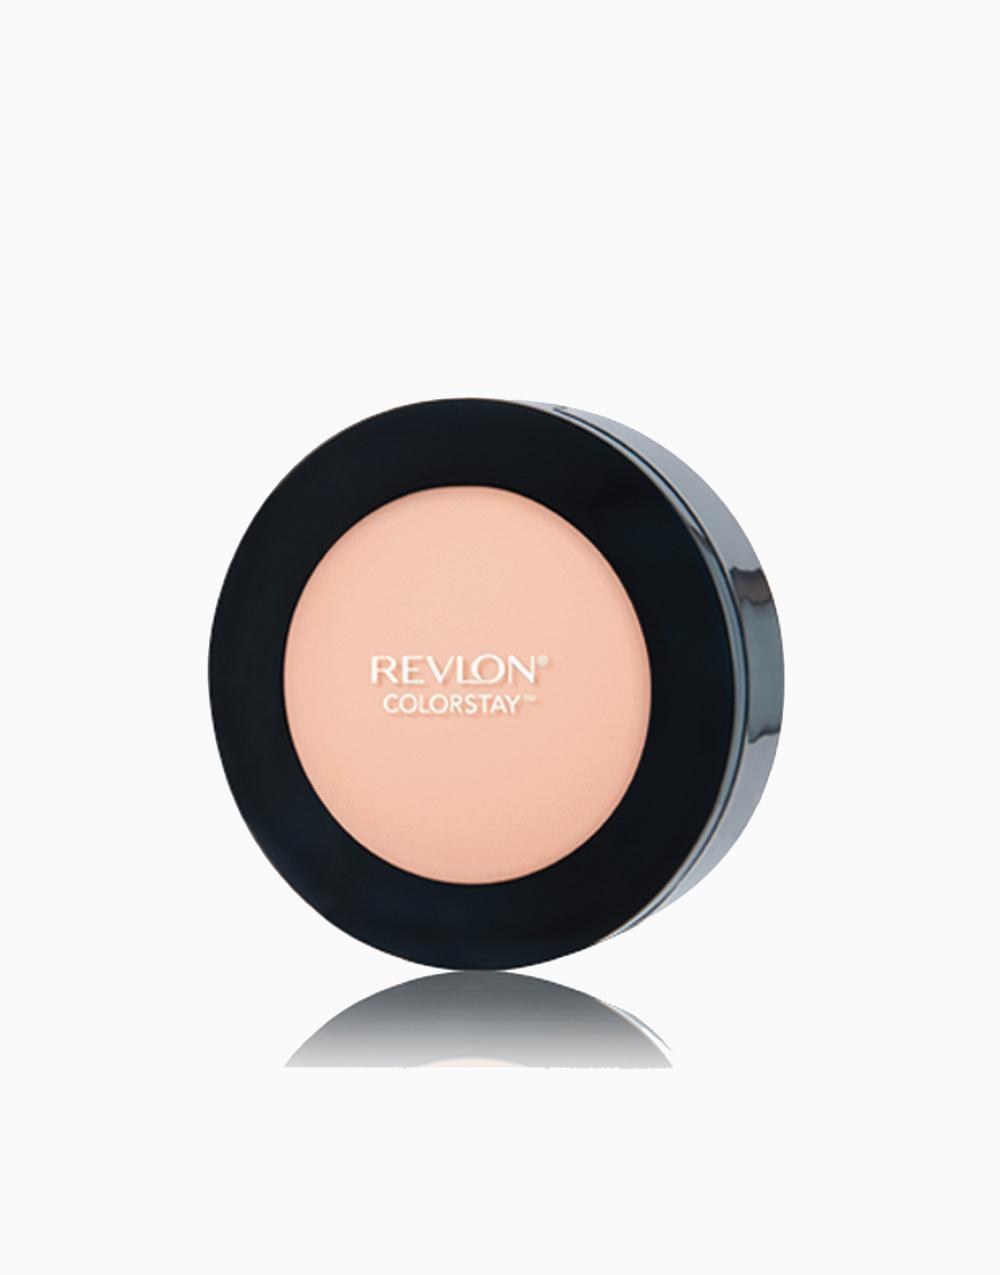 ColorStay Pressed Powder by Revlon | 830 Light/Medium